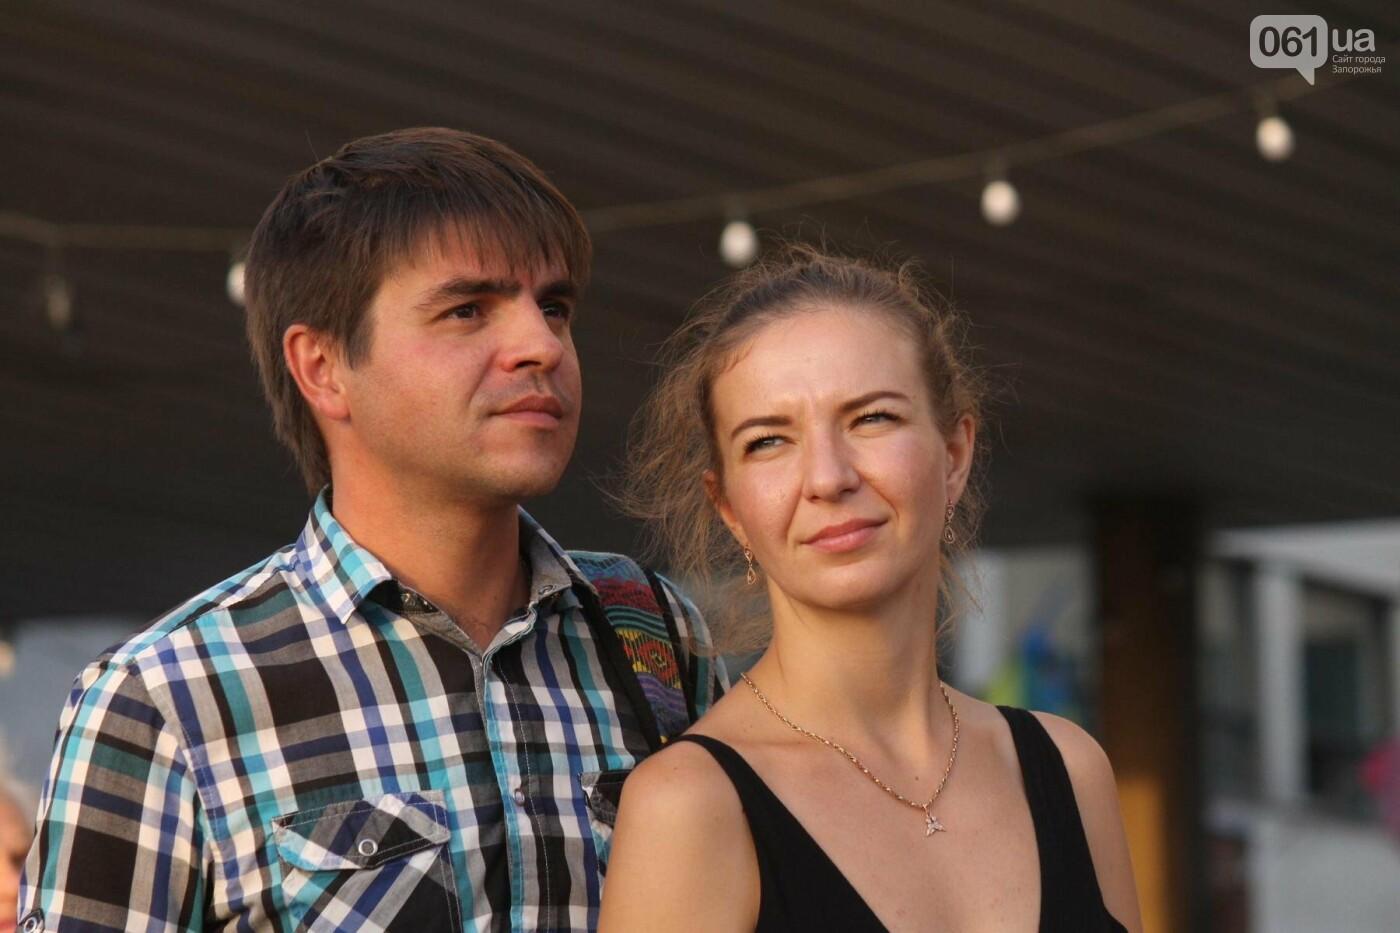 Найди себя: 50 портретов посетителей фестиваля Khortytsia Freedom, – ФОТОРЕПОРТАЖ, фото-8